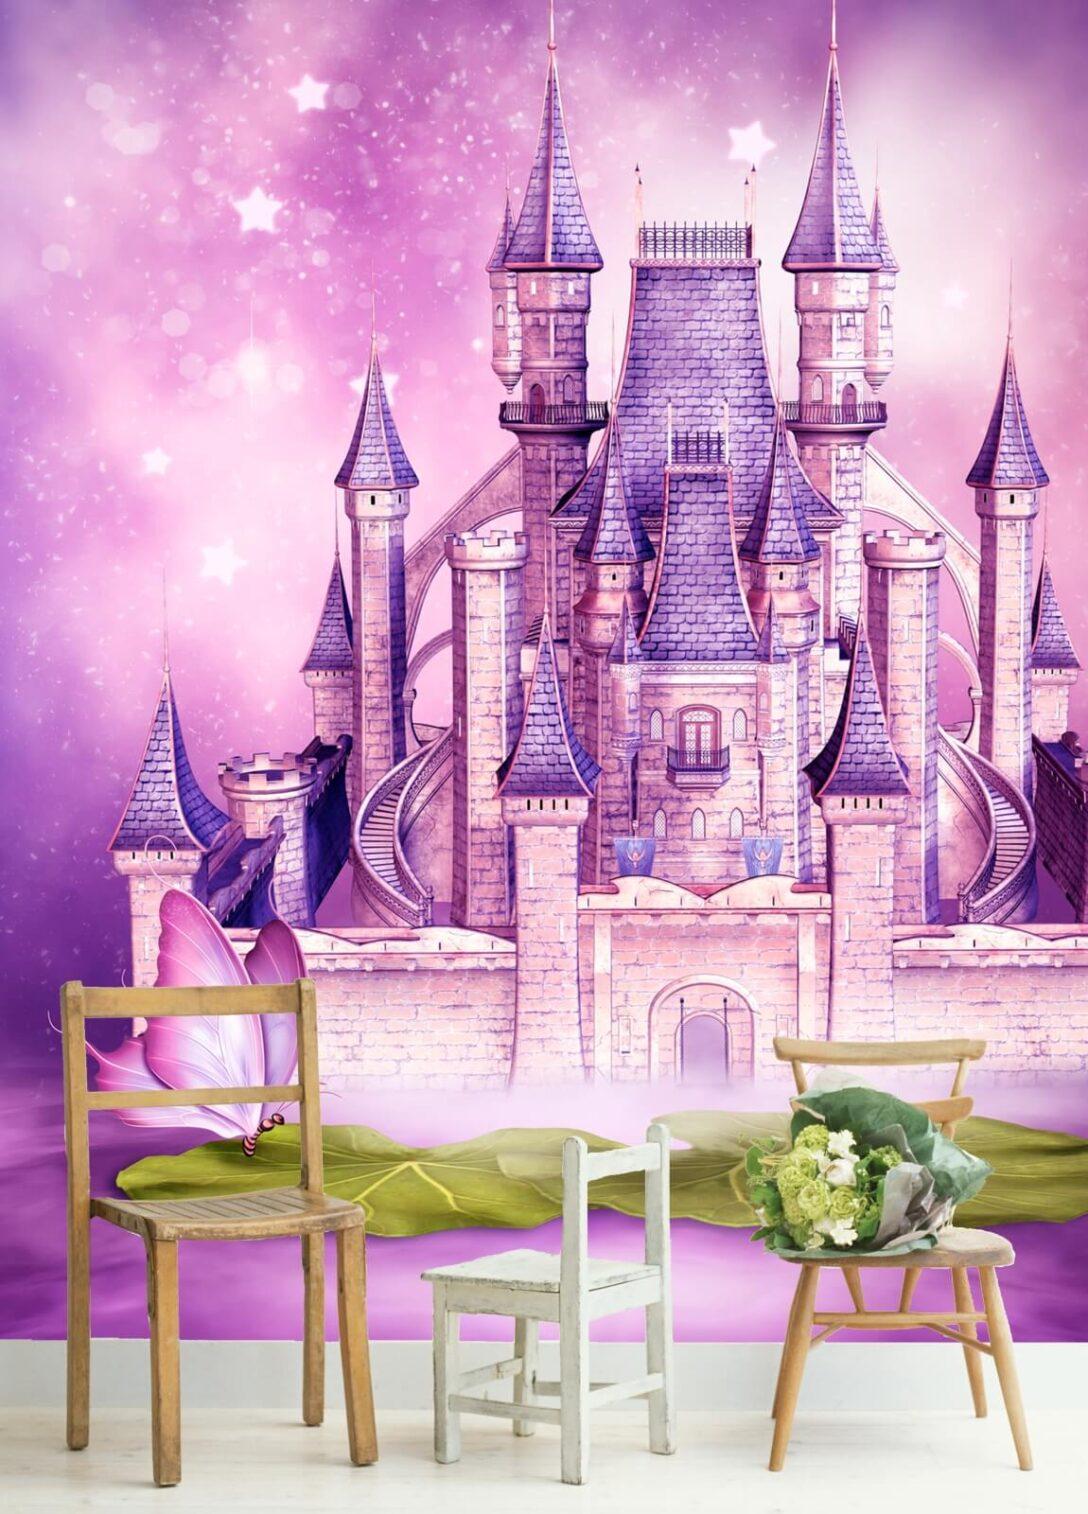 Large Size of Prinzessinnen Kinderzimmer Playmobil Prinzessin Gebraucht Prinzessinen Bett Pinolino Karolin Lillifee Komplett Vlies Tapete Fototapete Schloss Rosa Regal Weiß Kinderzimmer Kinderzimmer Prinzessin